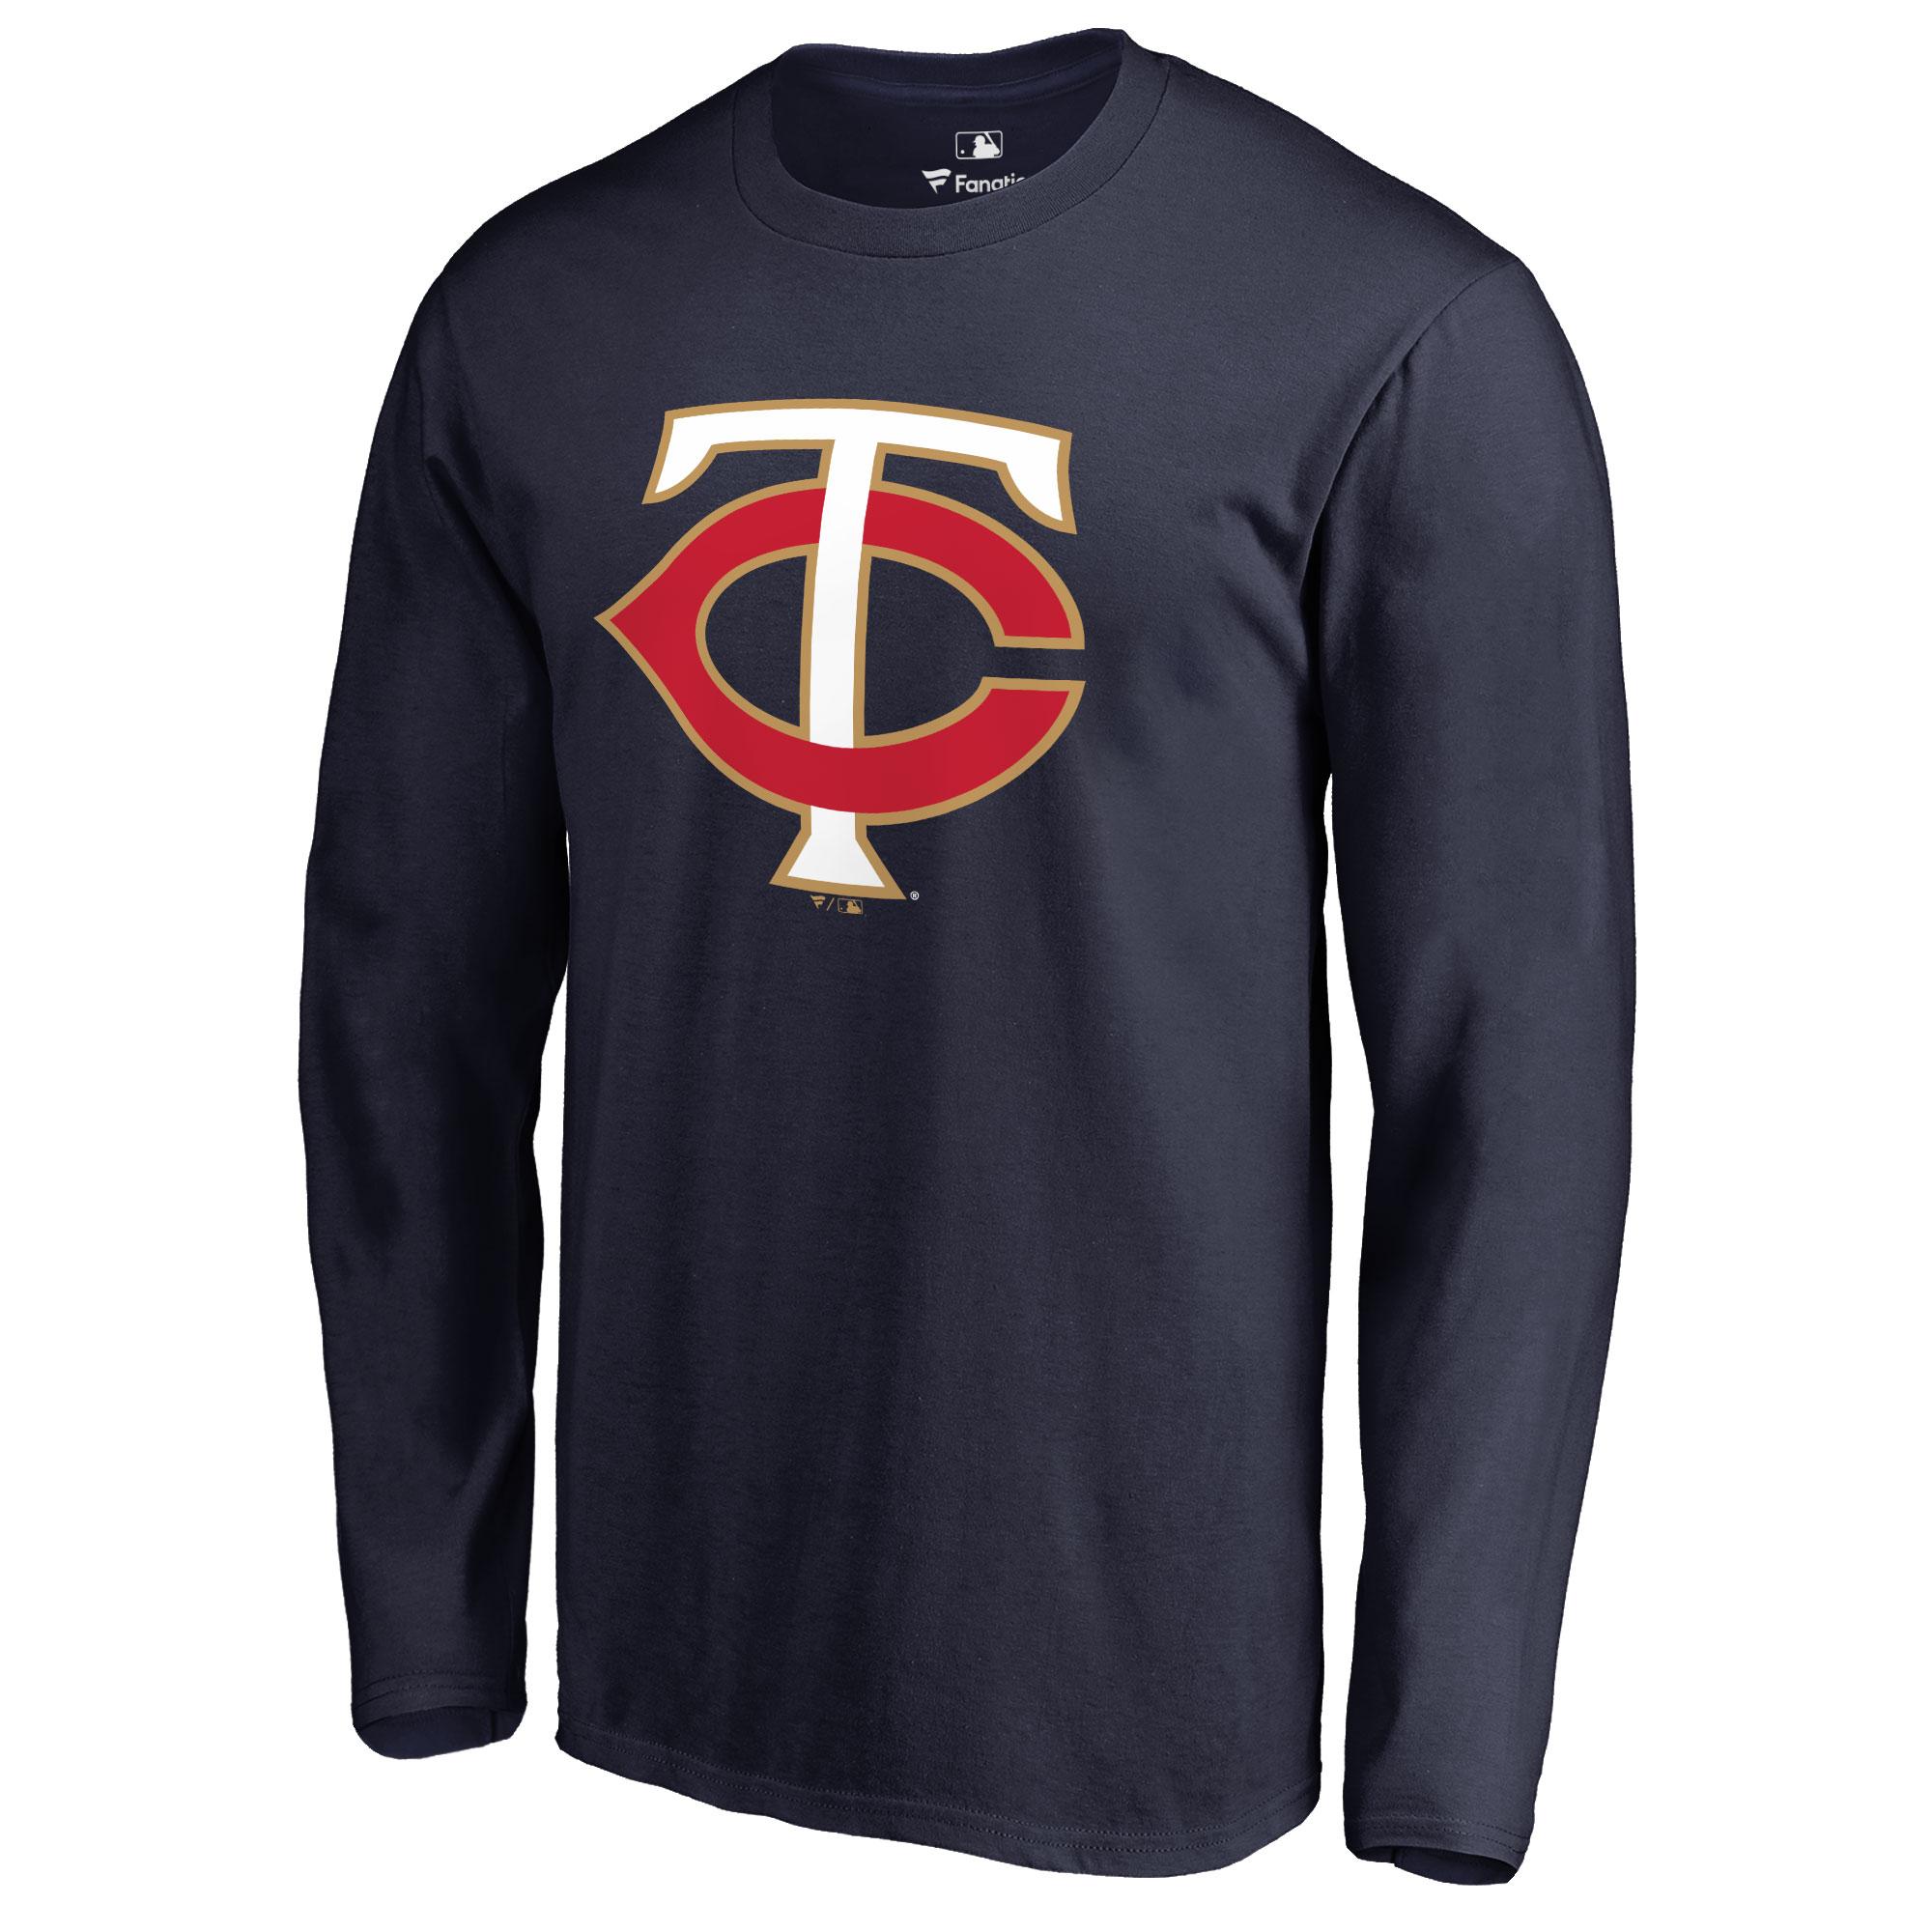 Minnesota Twins Team Color Primary Logo Long Sleeve T-Shirt - Navy